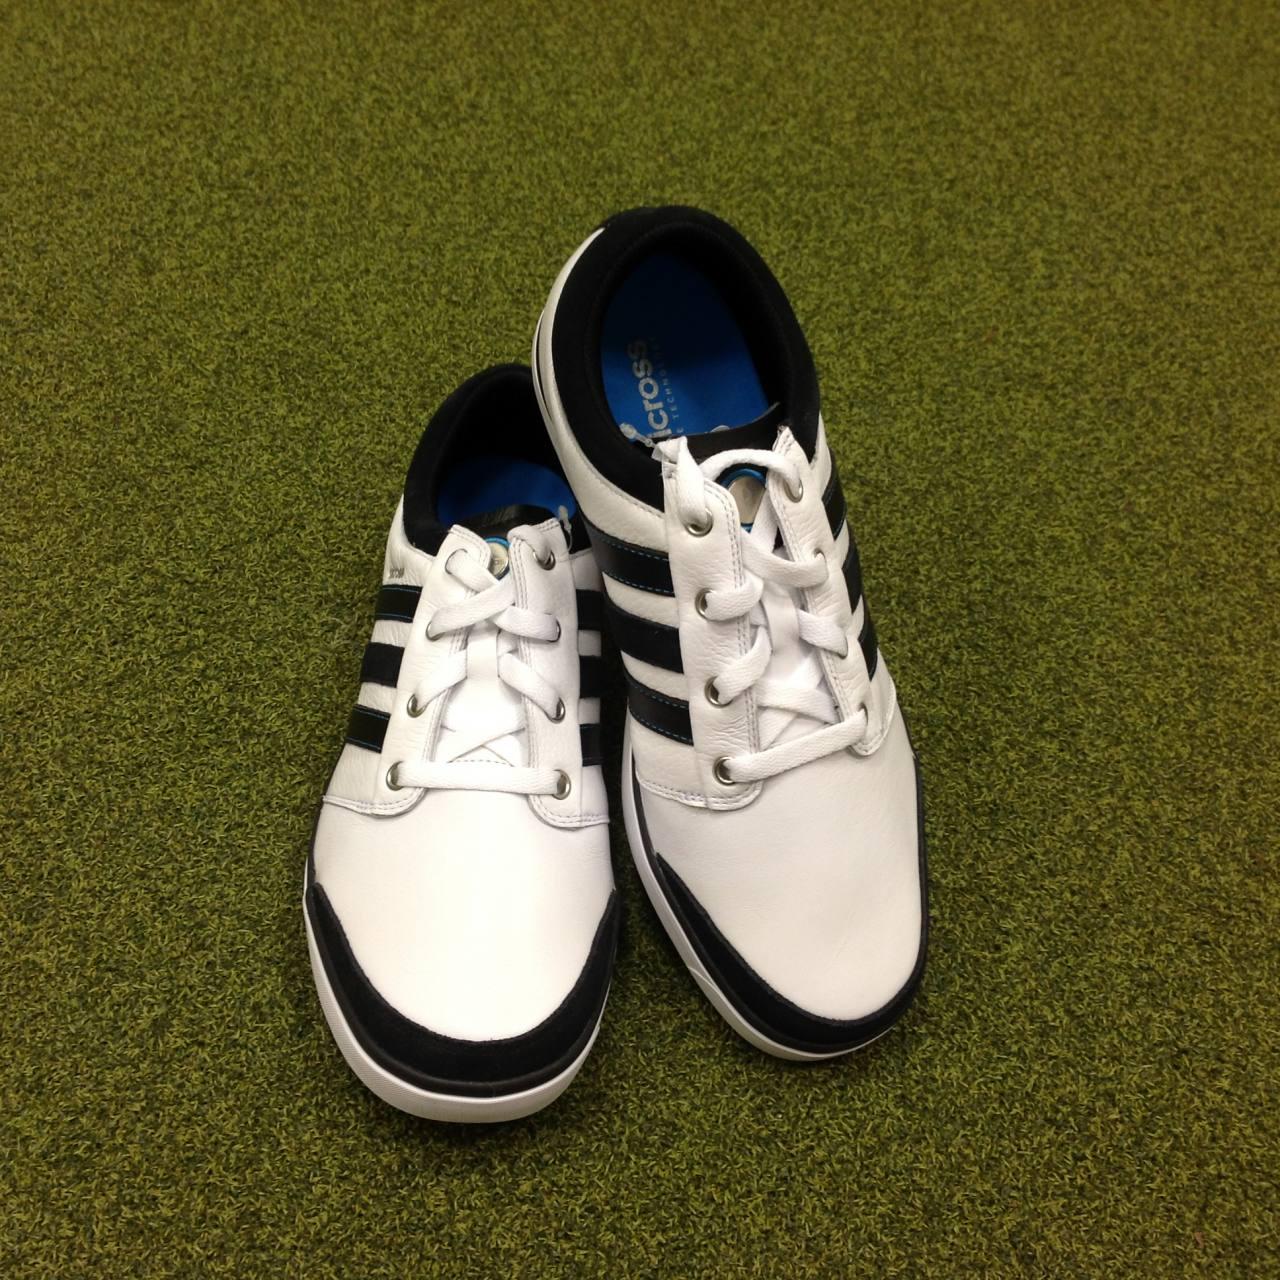 NEW Adidas Adicross Gripmore Golf Shoes - UK Size 8.5 - US 9 - EU 42 ... c6dfbe1233